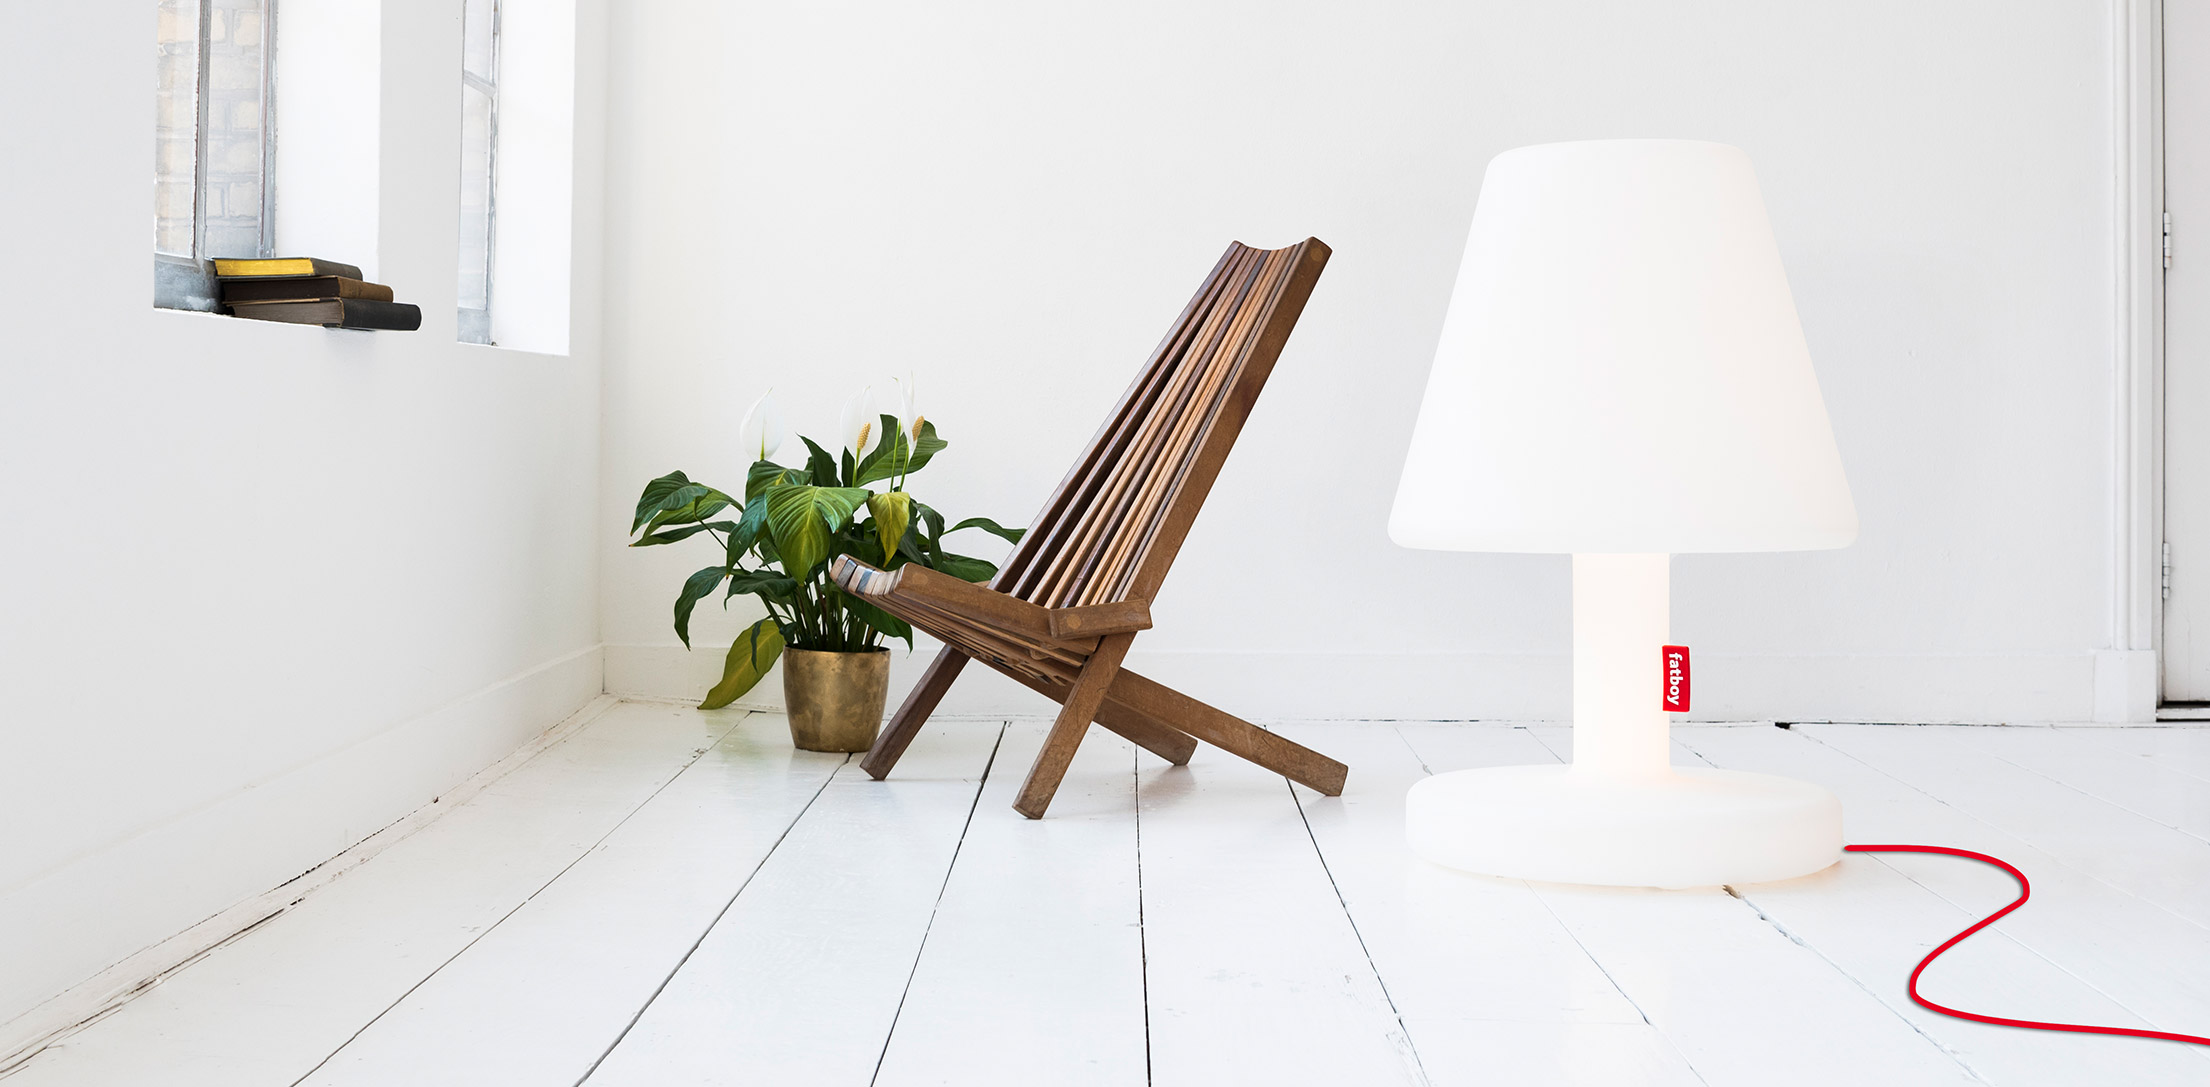 edison the grand moderne vloerlamp voor binnen n buiten fatboy. Black Bedroom Furniture Sets. Home Design Ideas